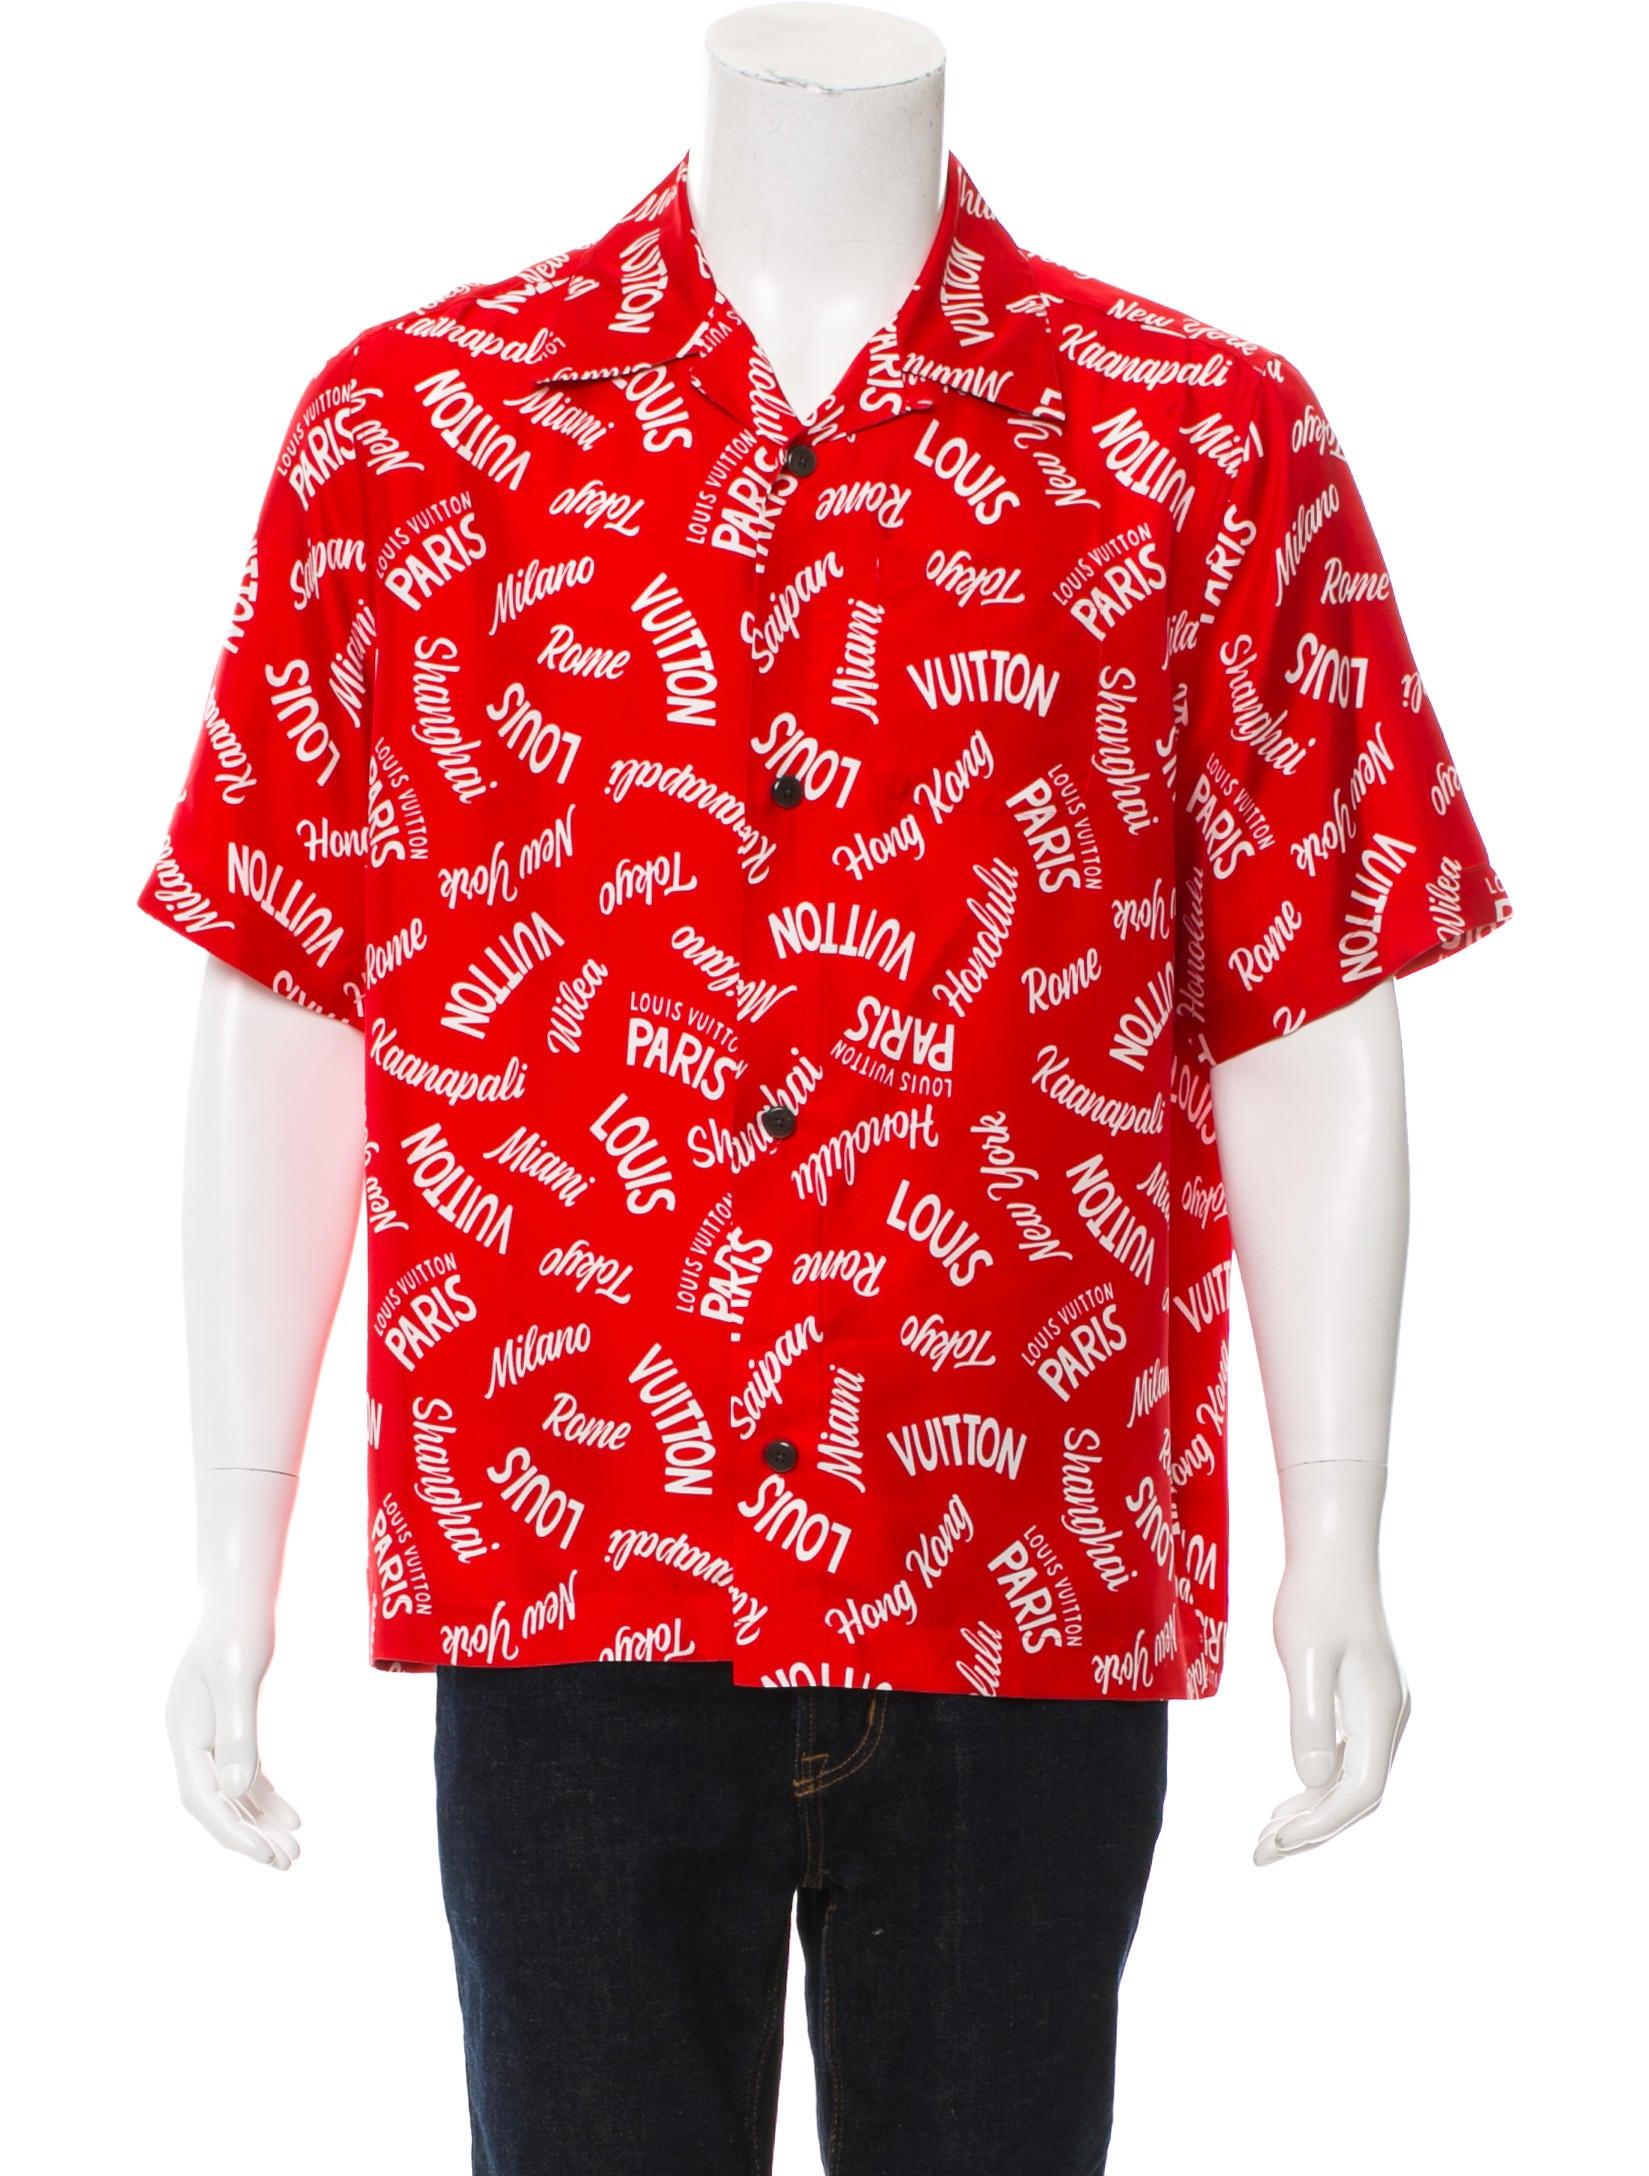 ad06e361 Louis Vuitton 2018 Hawaiian Silk Shirt - Clothing - LOU160847   The ...